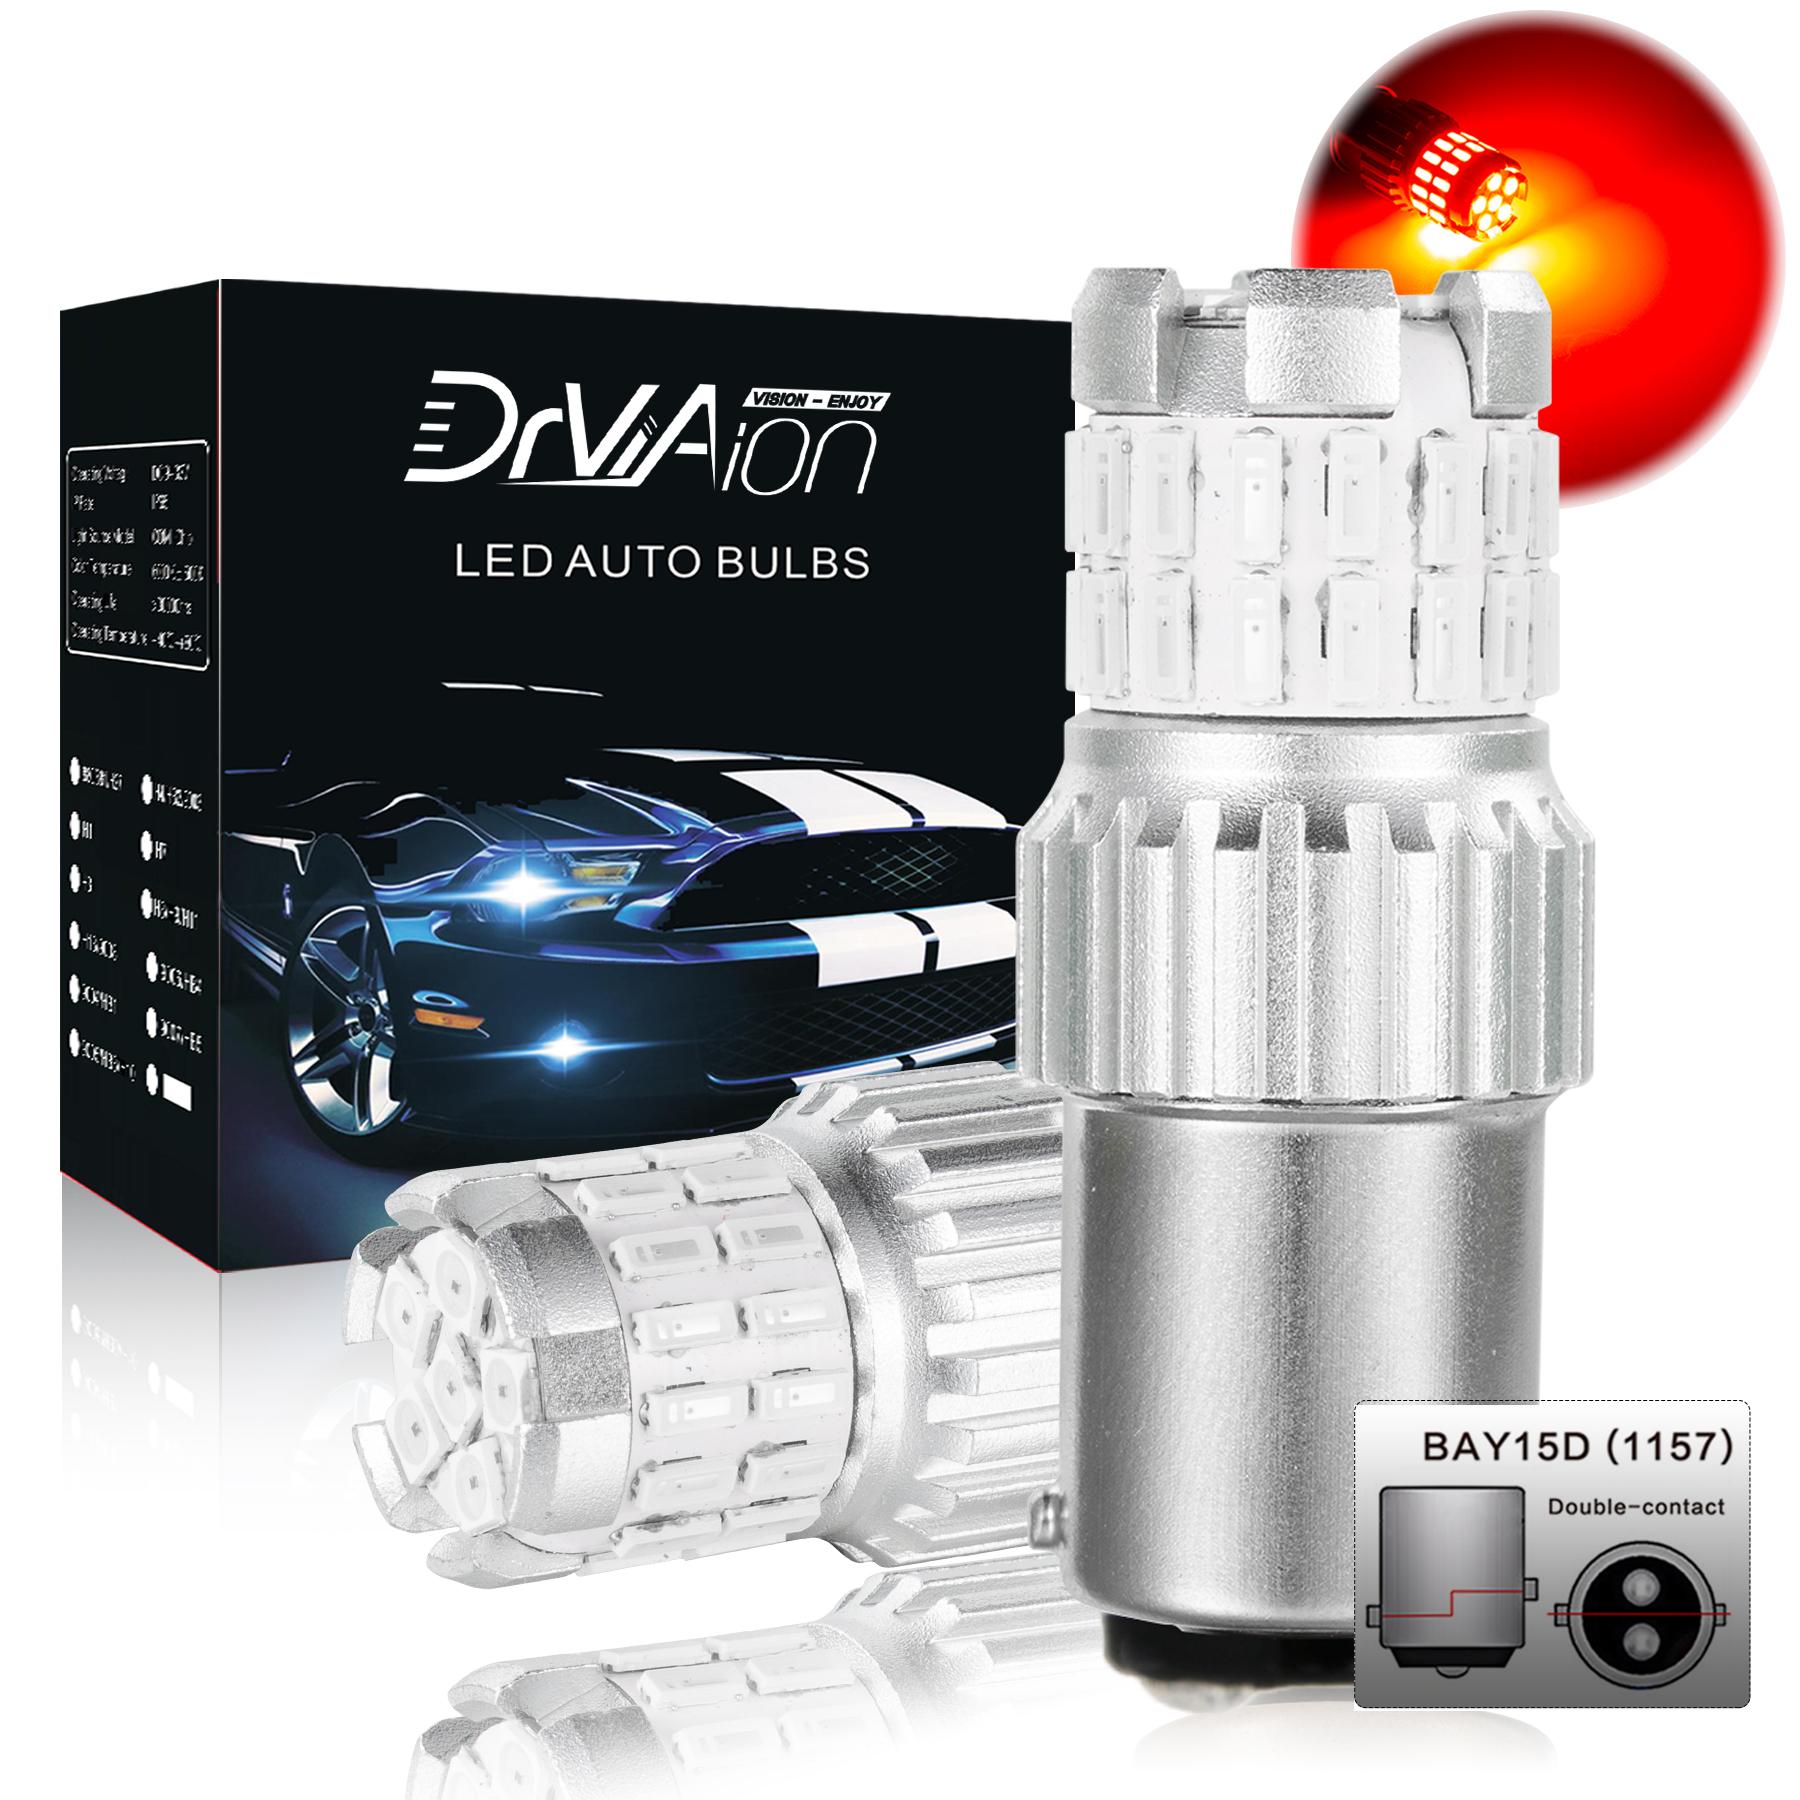 2pcs Fast Heat Disspation Aluminum LED Bulb for Drviaion 1156/1157Canbus Light Red light_1157 bay15d p21-5w